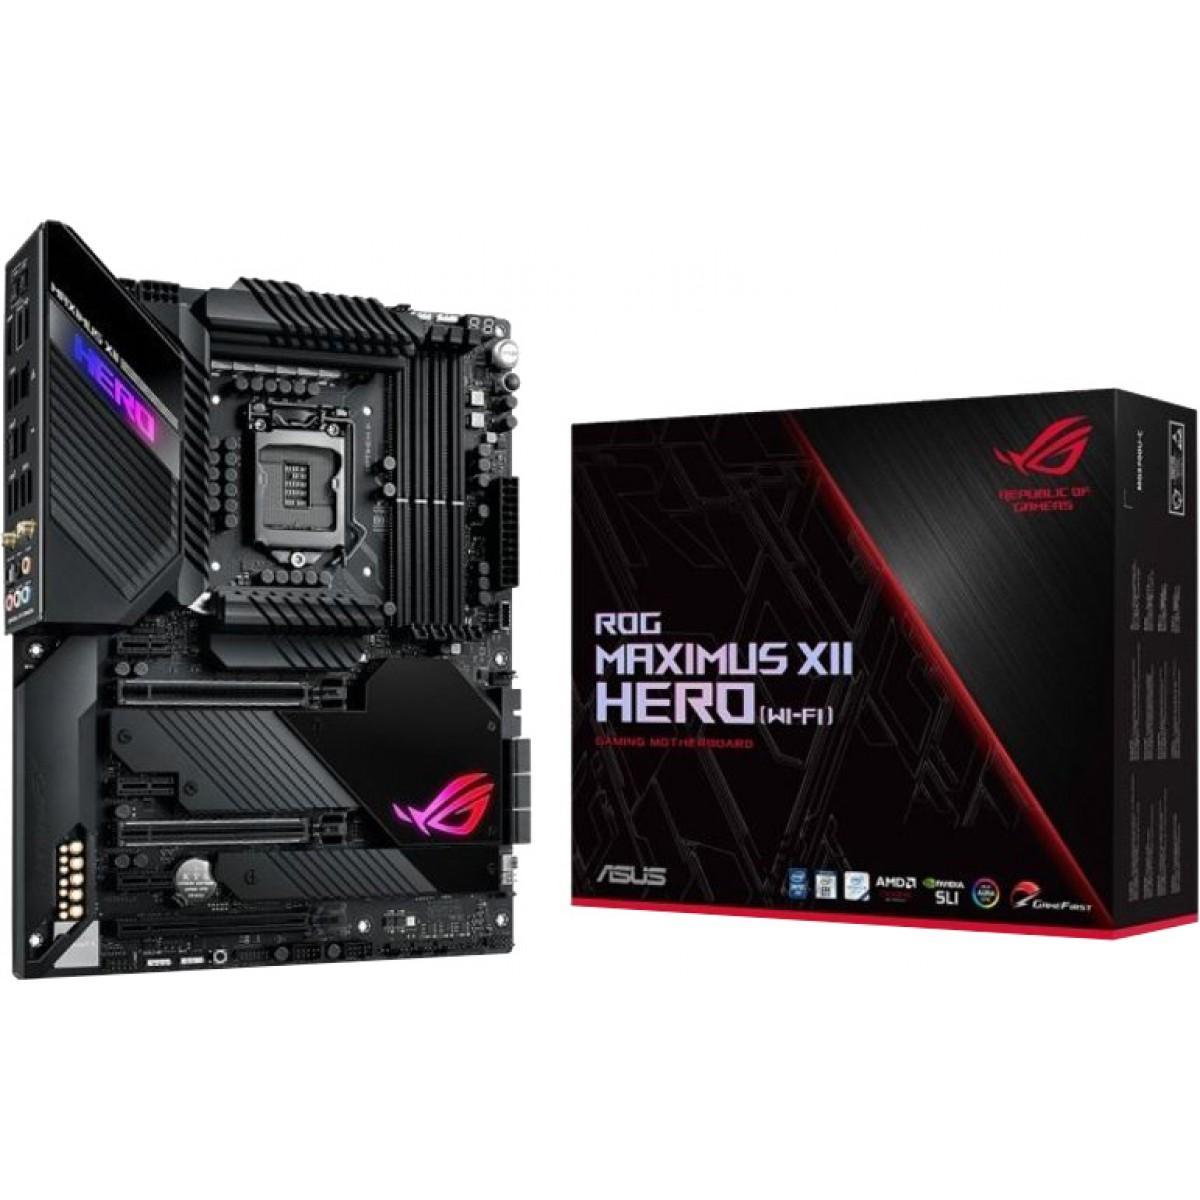 Placa Mãe Asus Rog Maximus Xii Hero Wi-fi, Chipset Z490, Intel LGA 1200, ATX, DDR4